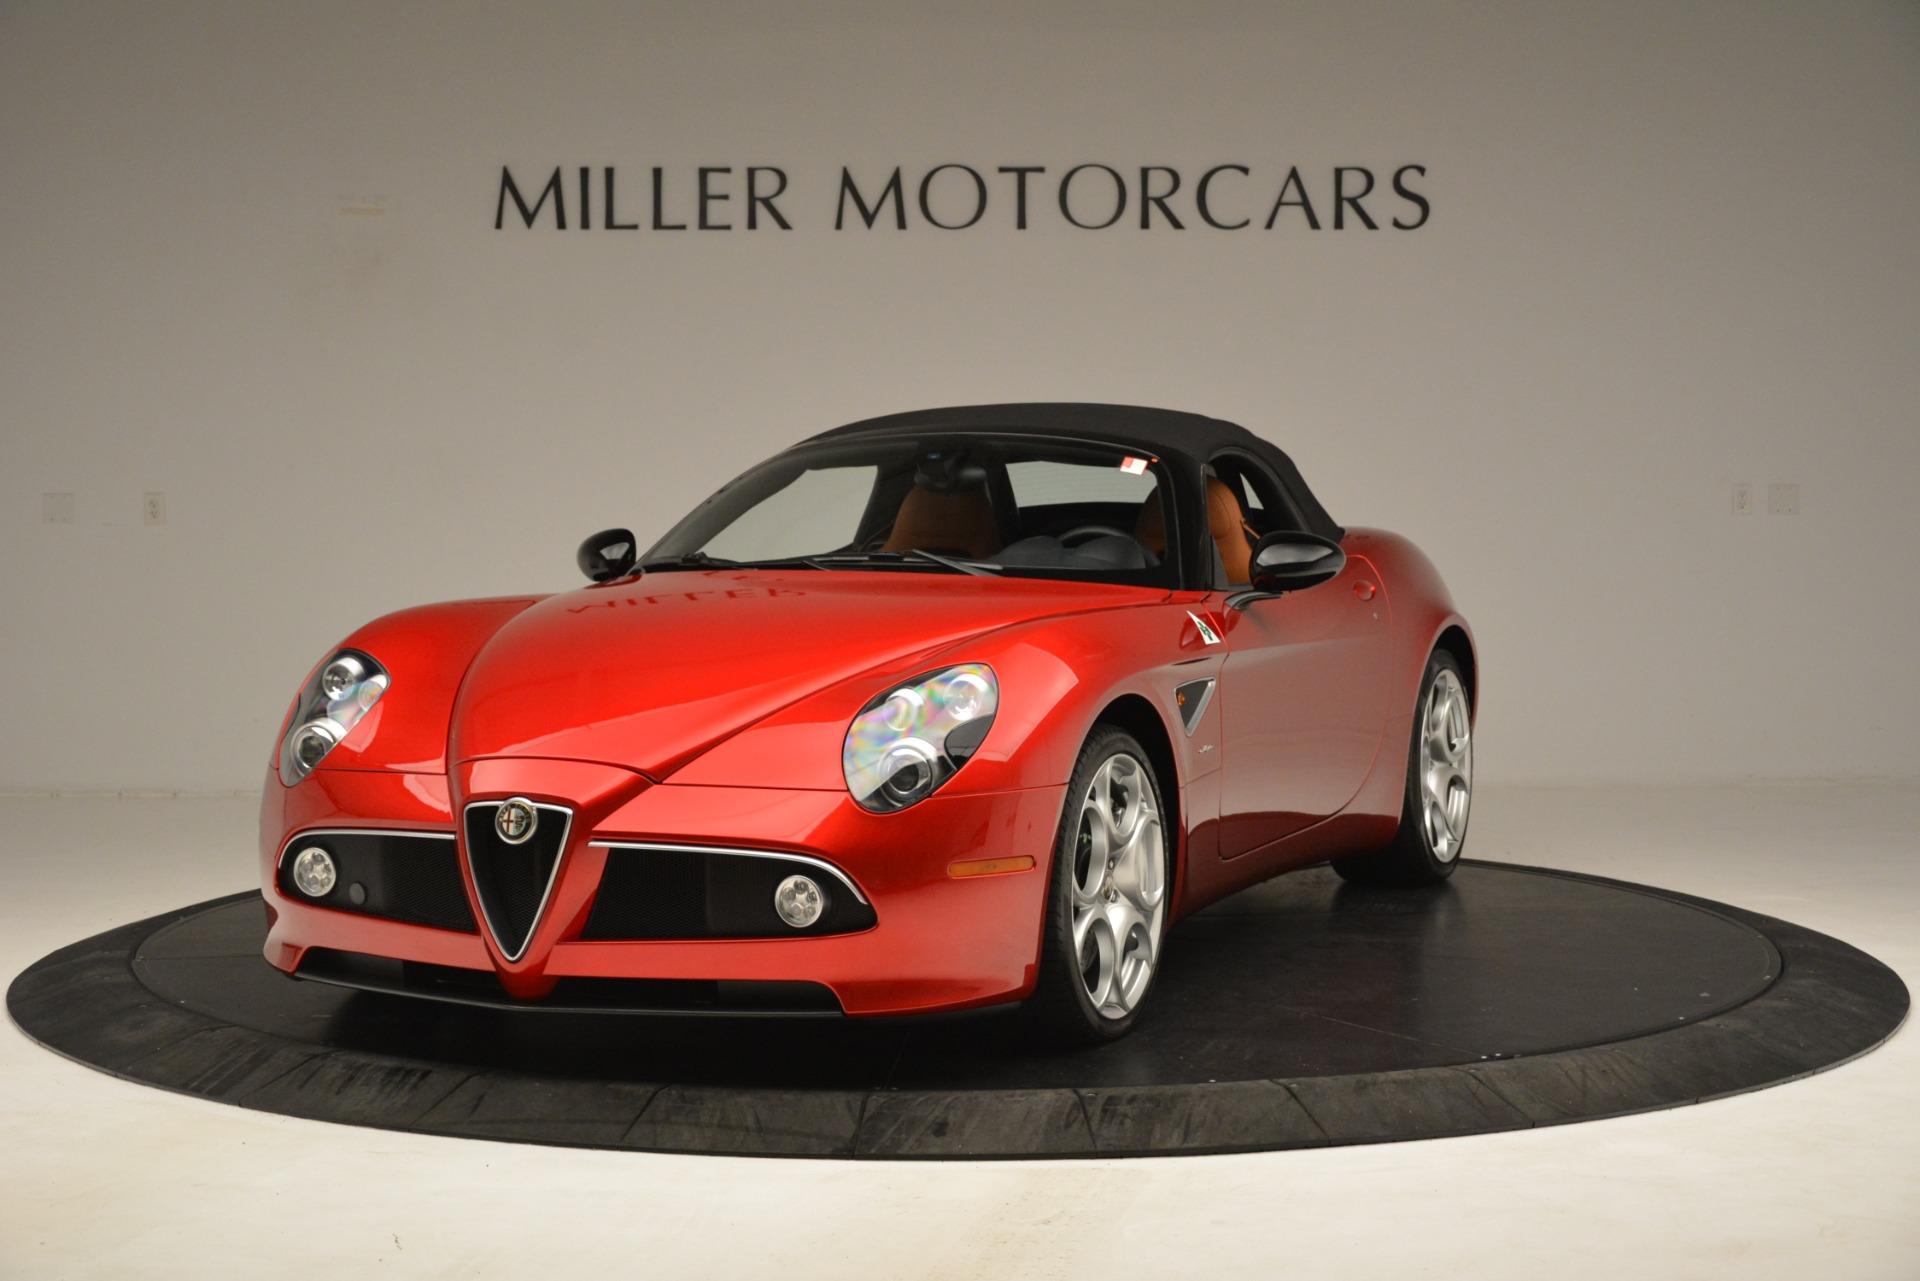 Used 2009 Alfa Romeo 8c Spider  For Sale In Greenwich, CT 3302_p13